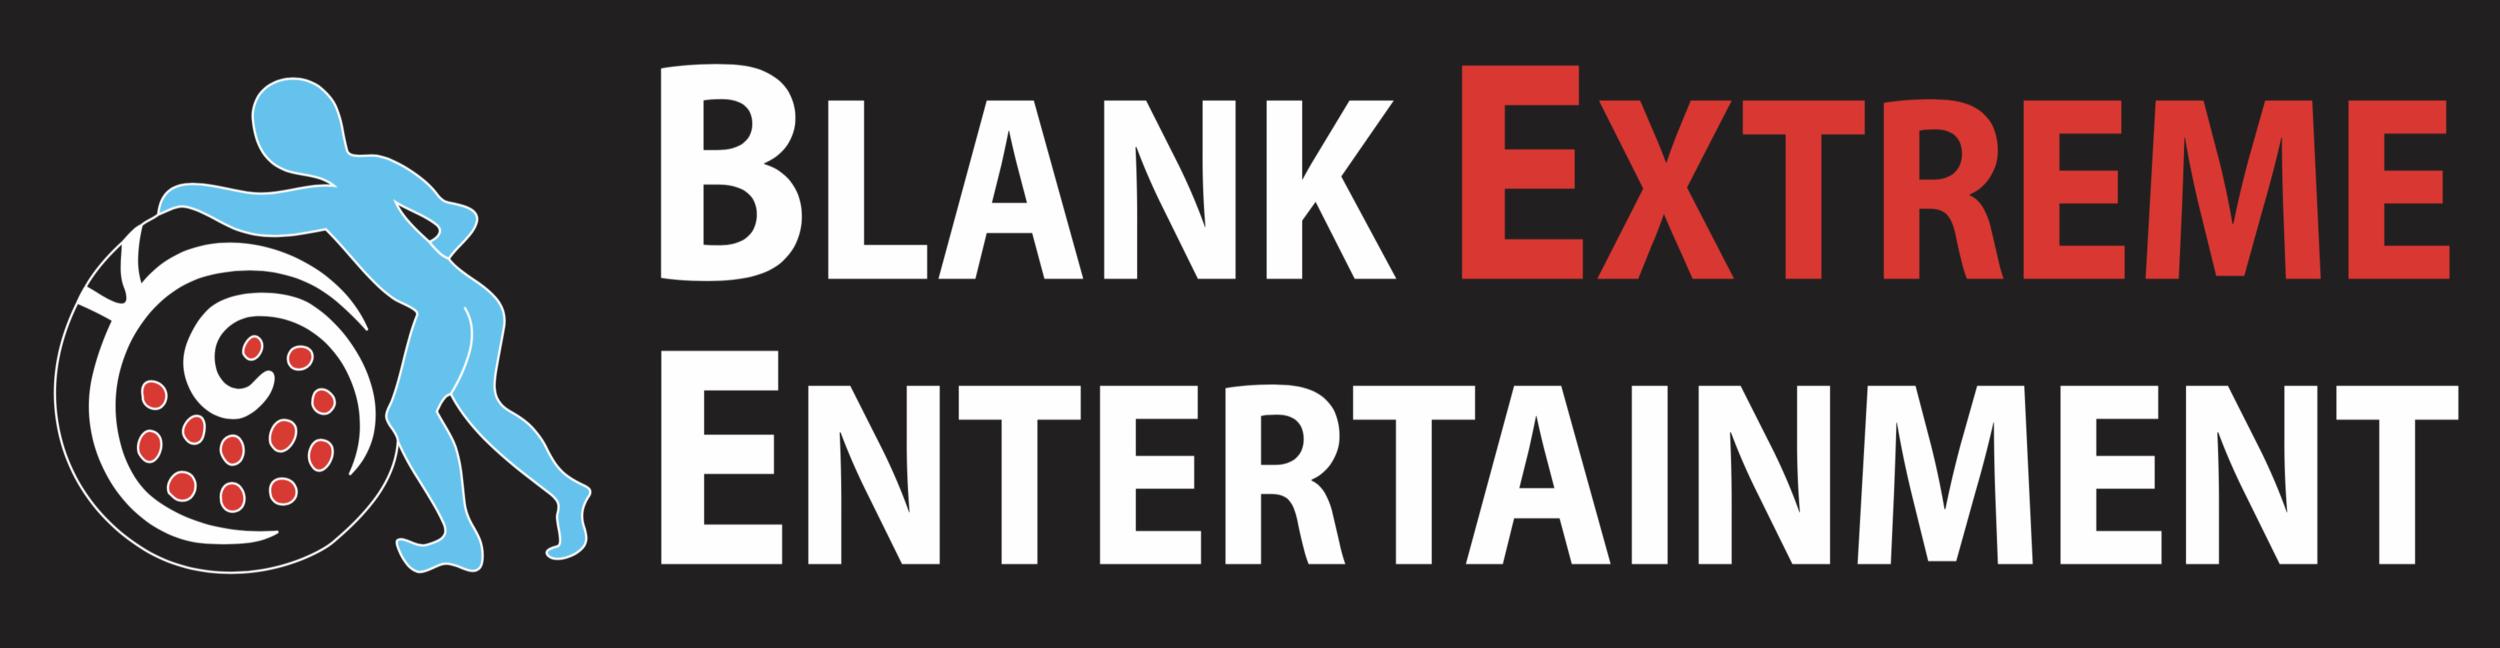 Blank Extreme Entertainment LLC